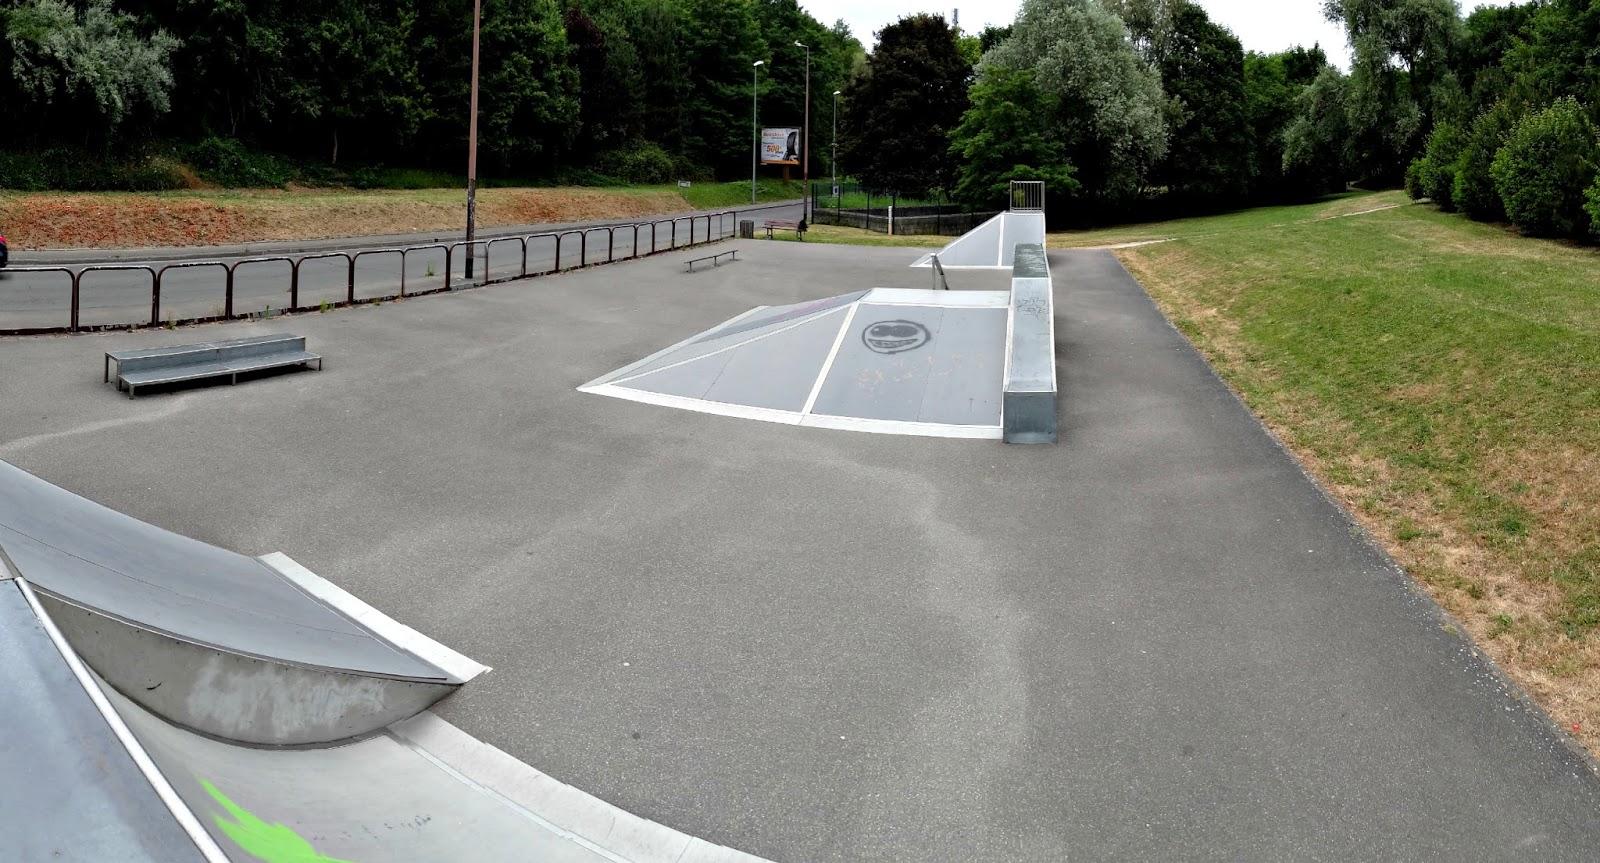 Skatepark Verrires Le Buisson